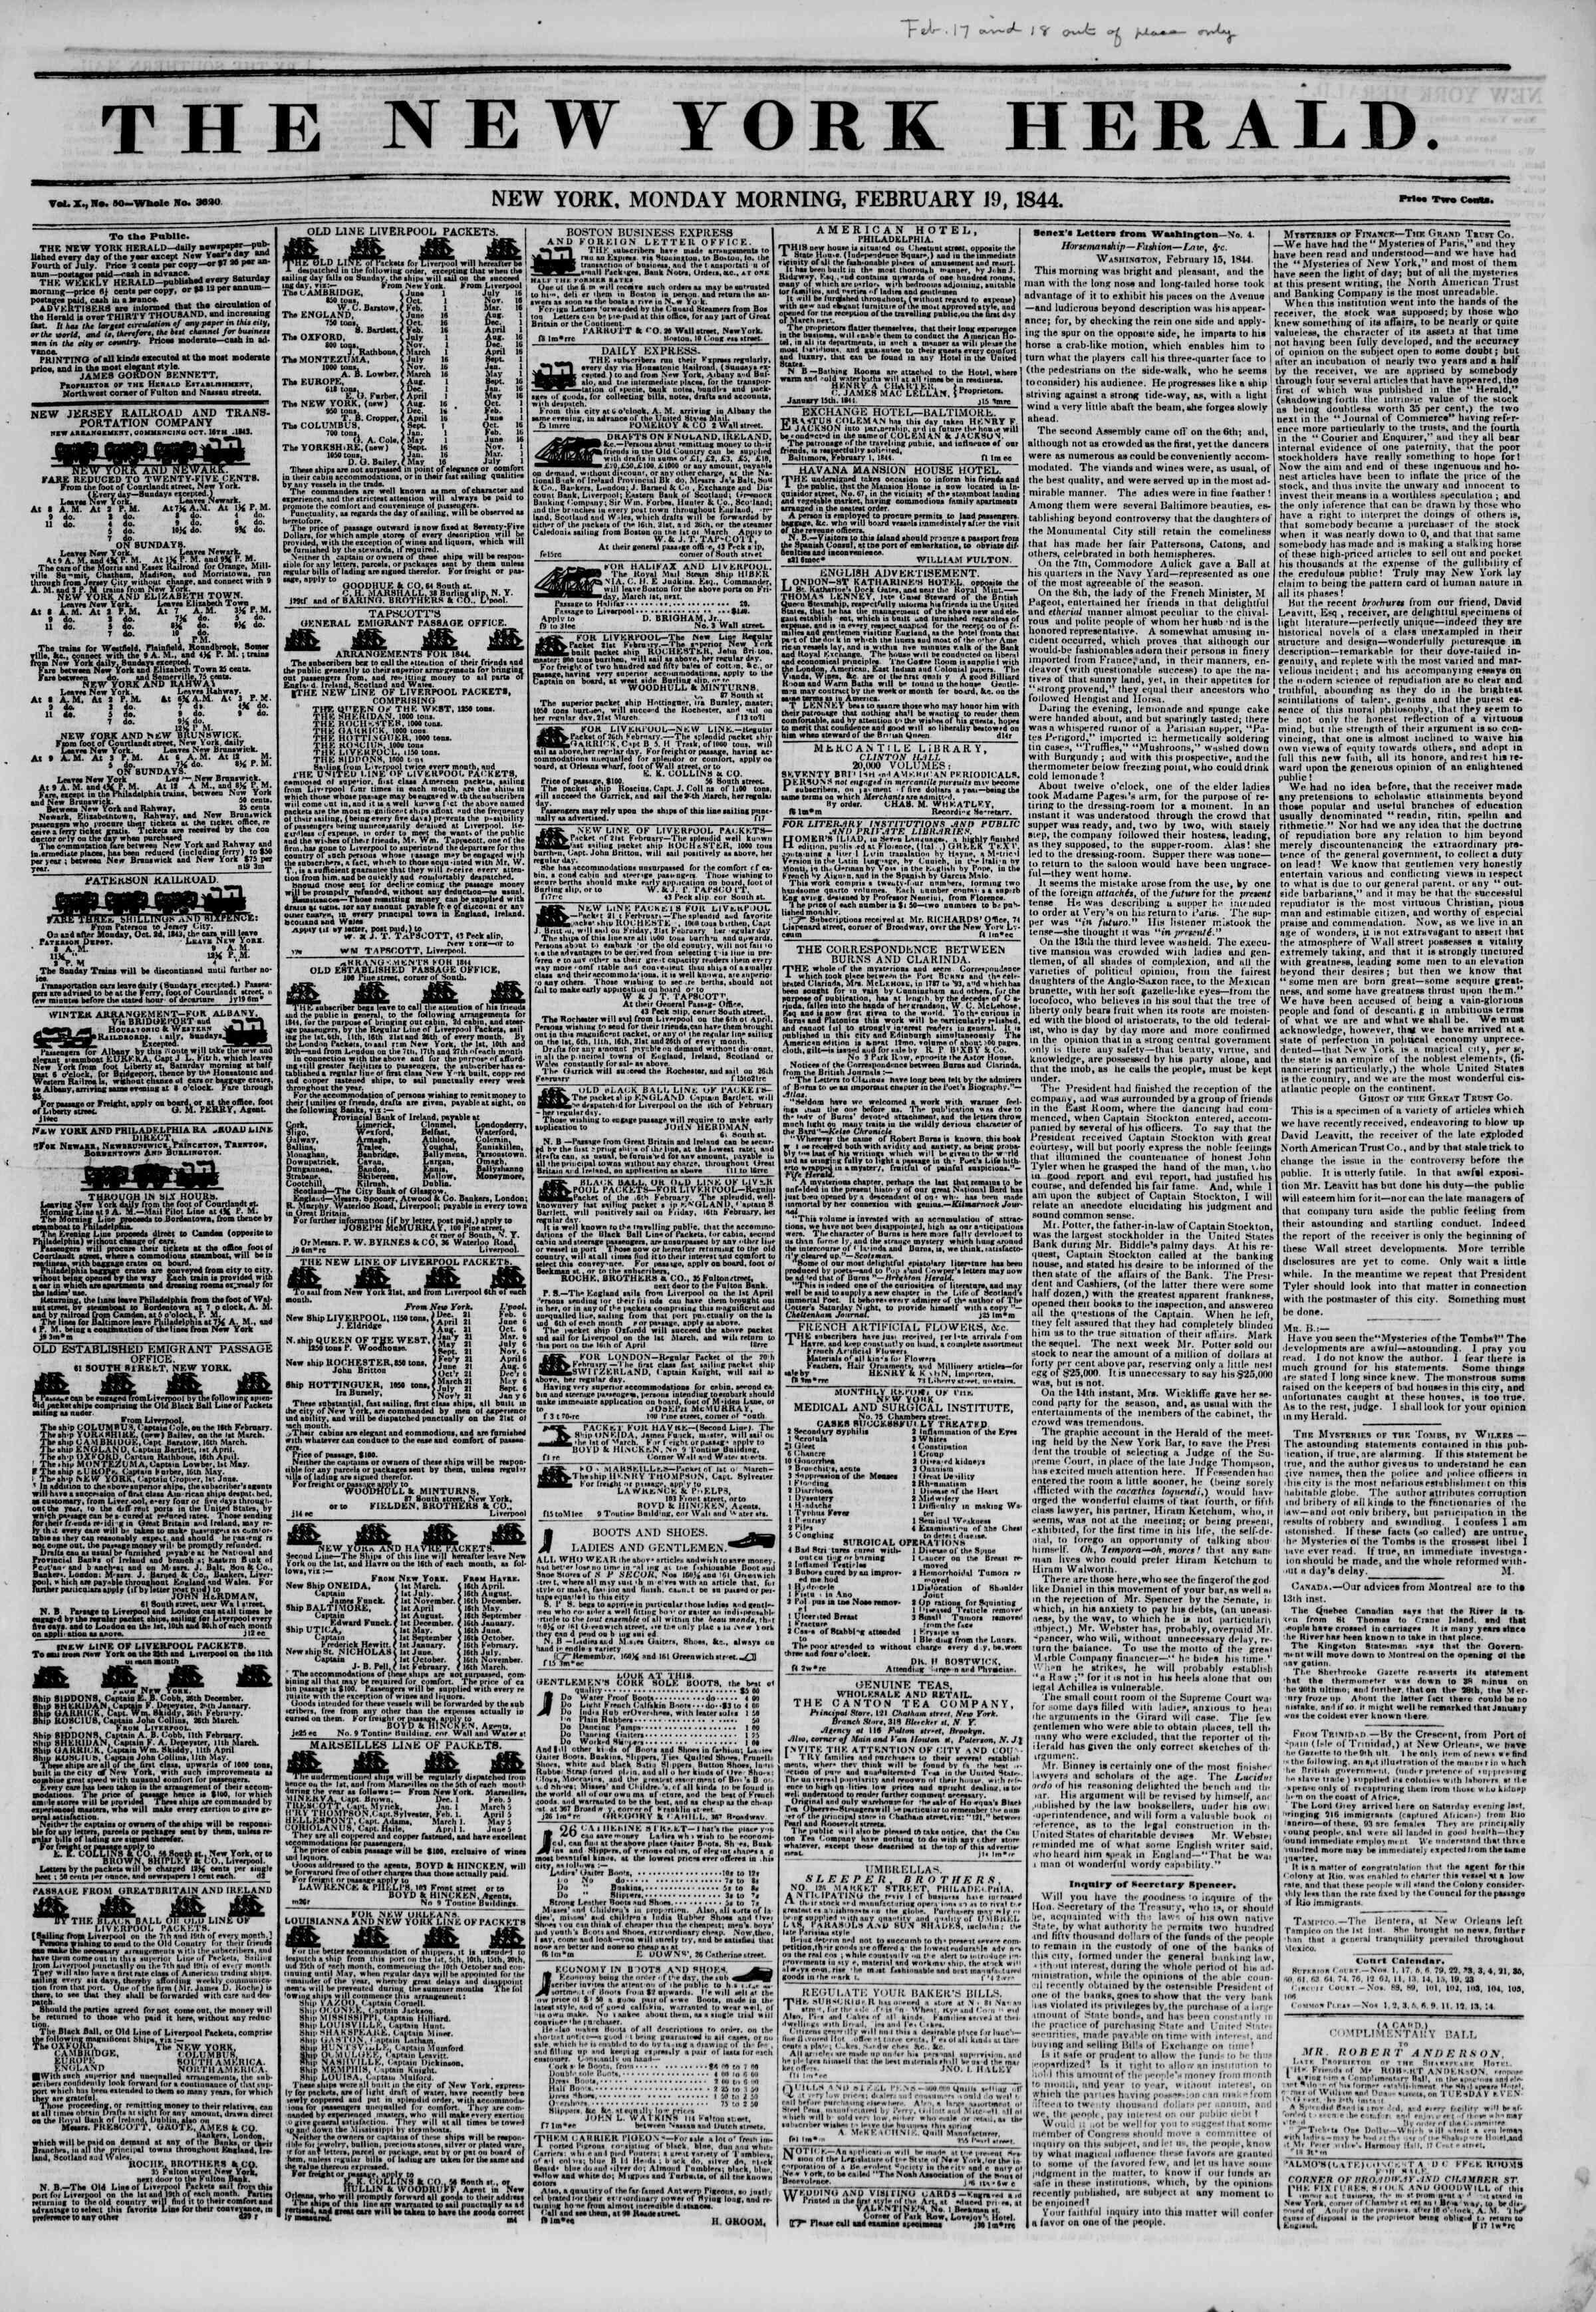 February 19, 1844 Tarihli The New York Herald Gazetesi Sayfa 1